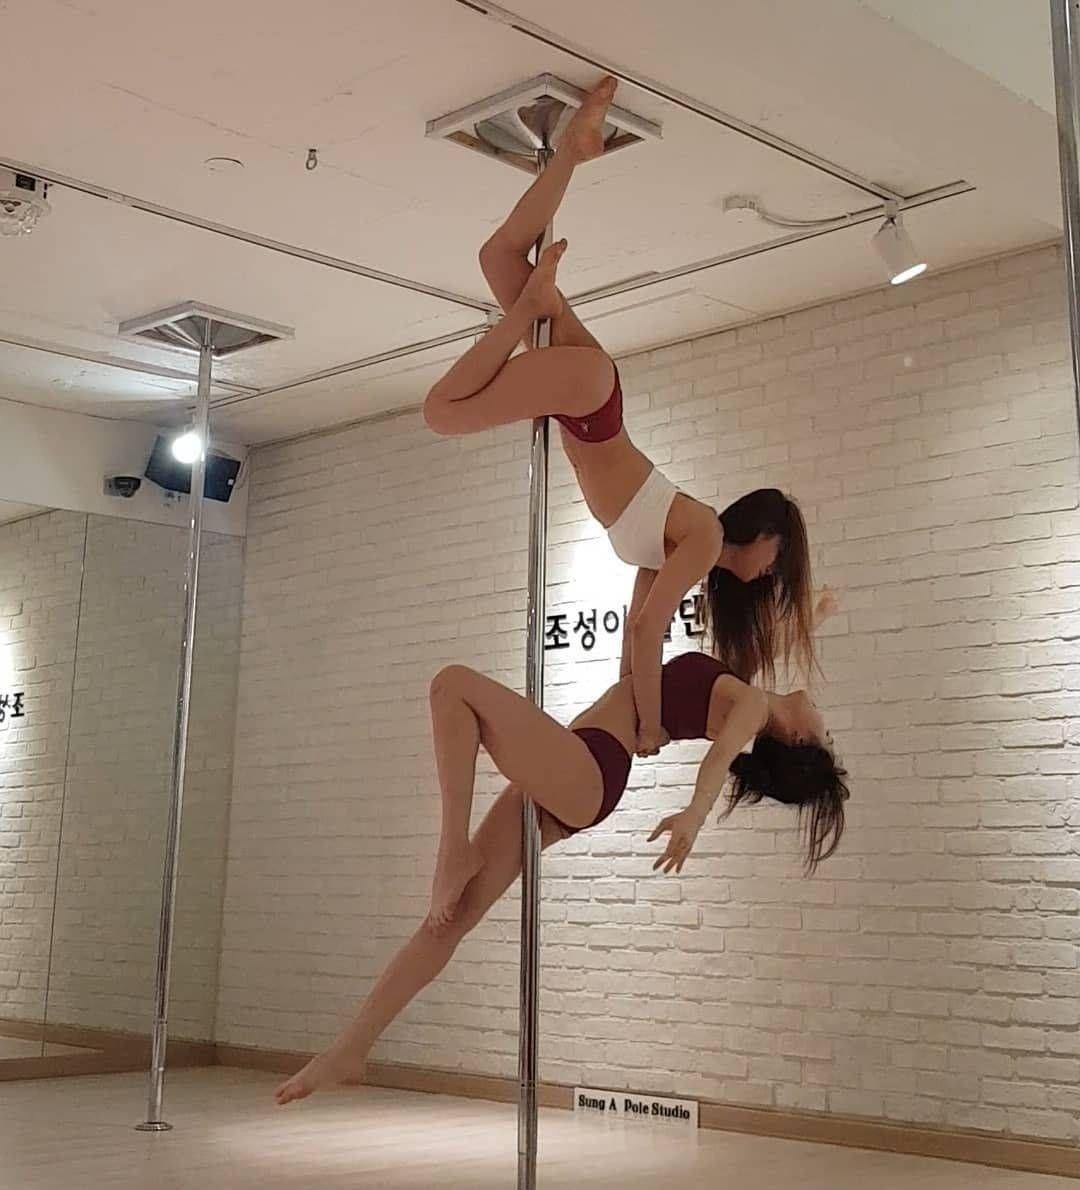 Gfriend Yuju At Sunga Pole Dance Studio With Images Pole